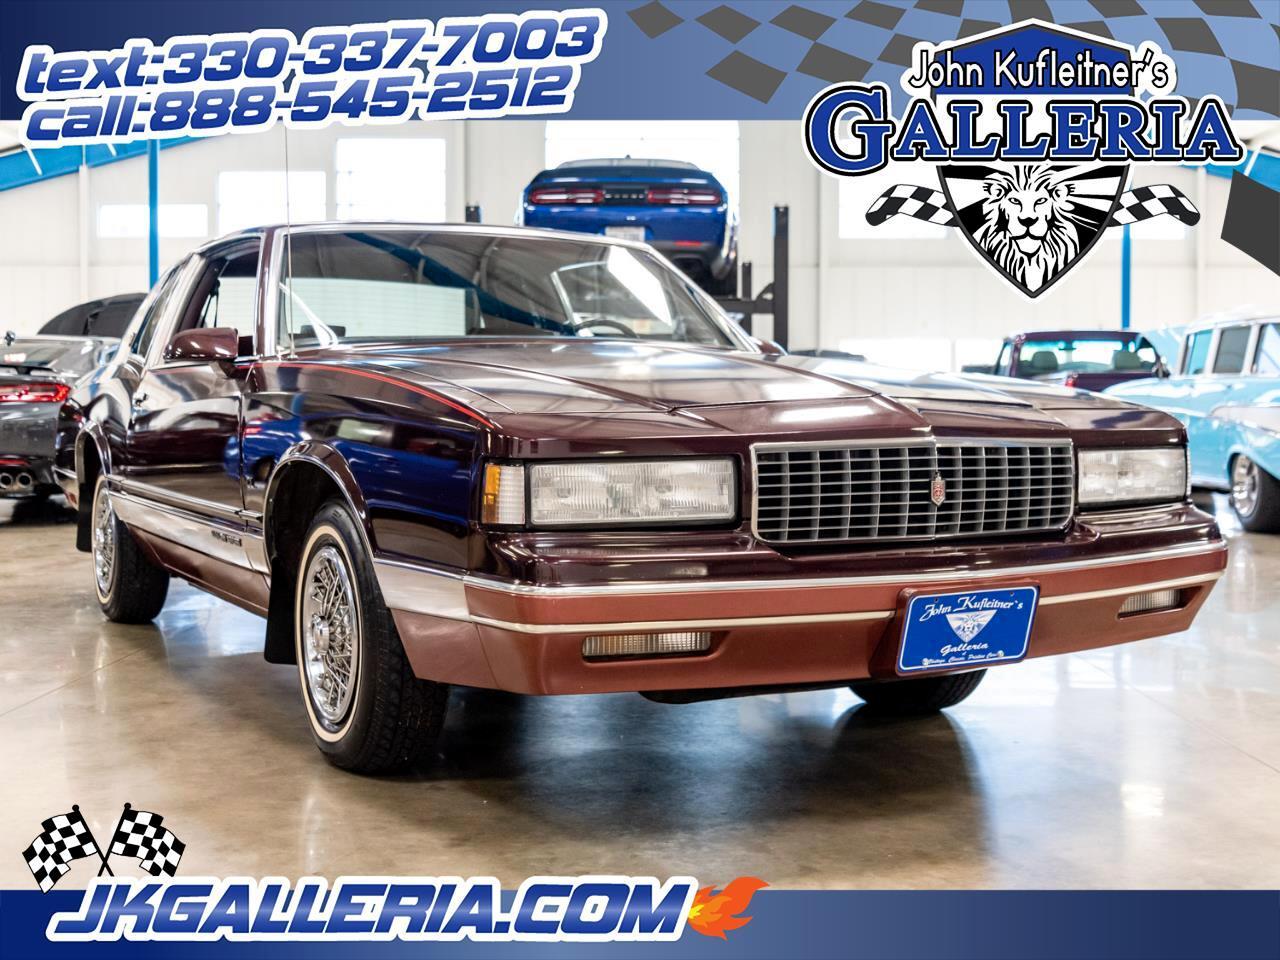 1986 Chevrolet Monte Carlo 2dr Sport Coupe LS